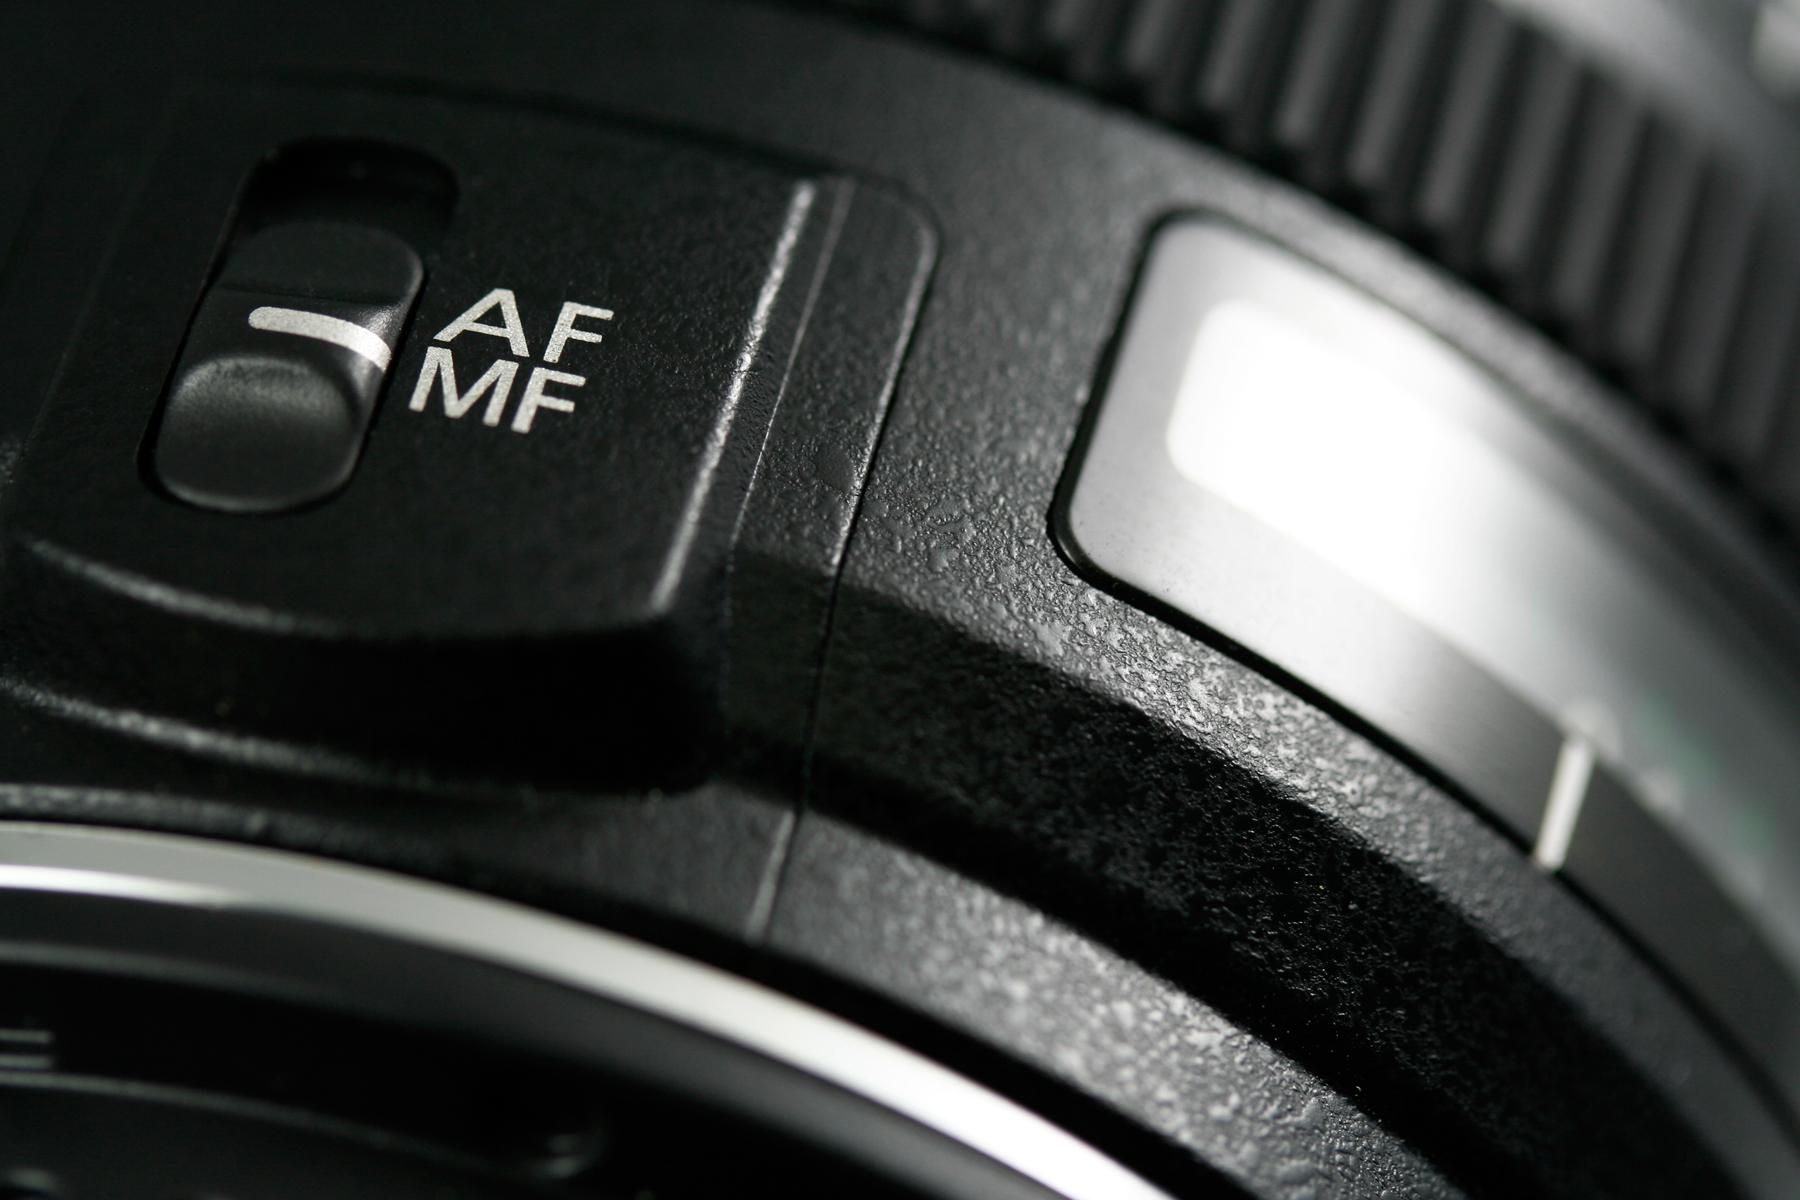 Lens Macro, 35, Photograph, Macro, Mm, HQ Photo